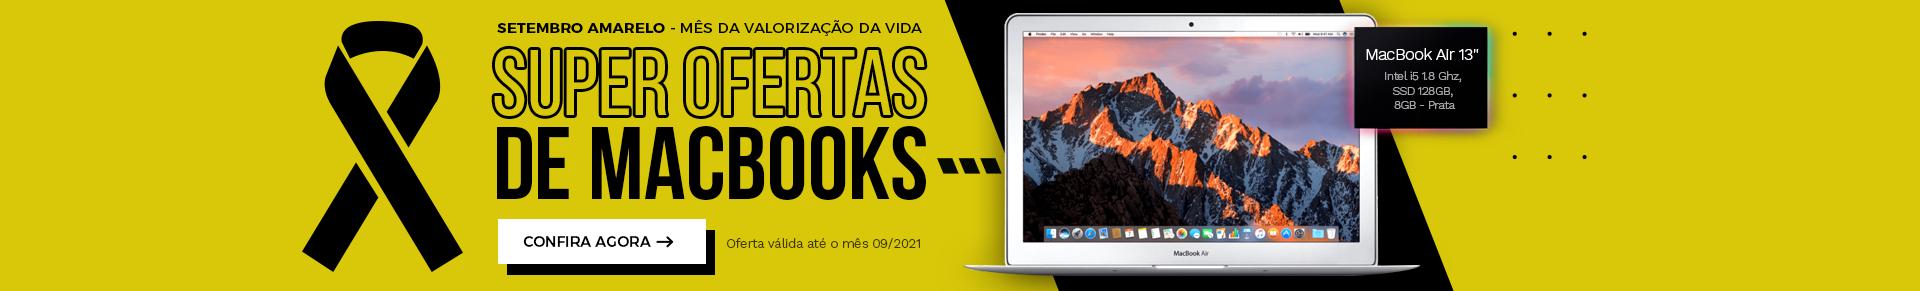 Setembro Amarelo 2021 - MacBook Air MQD32